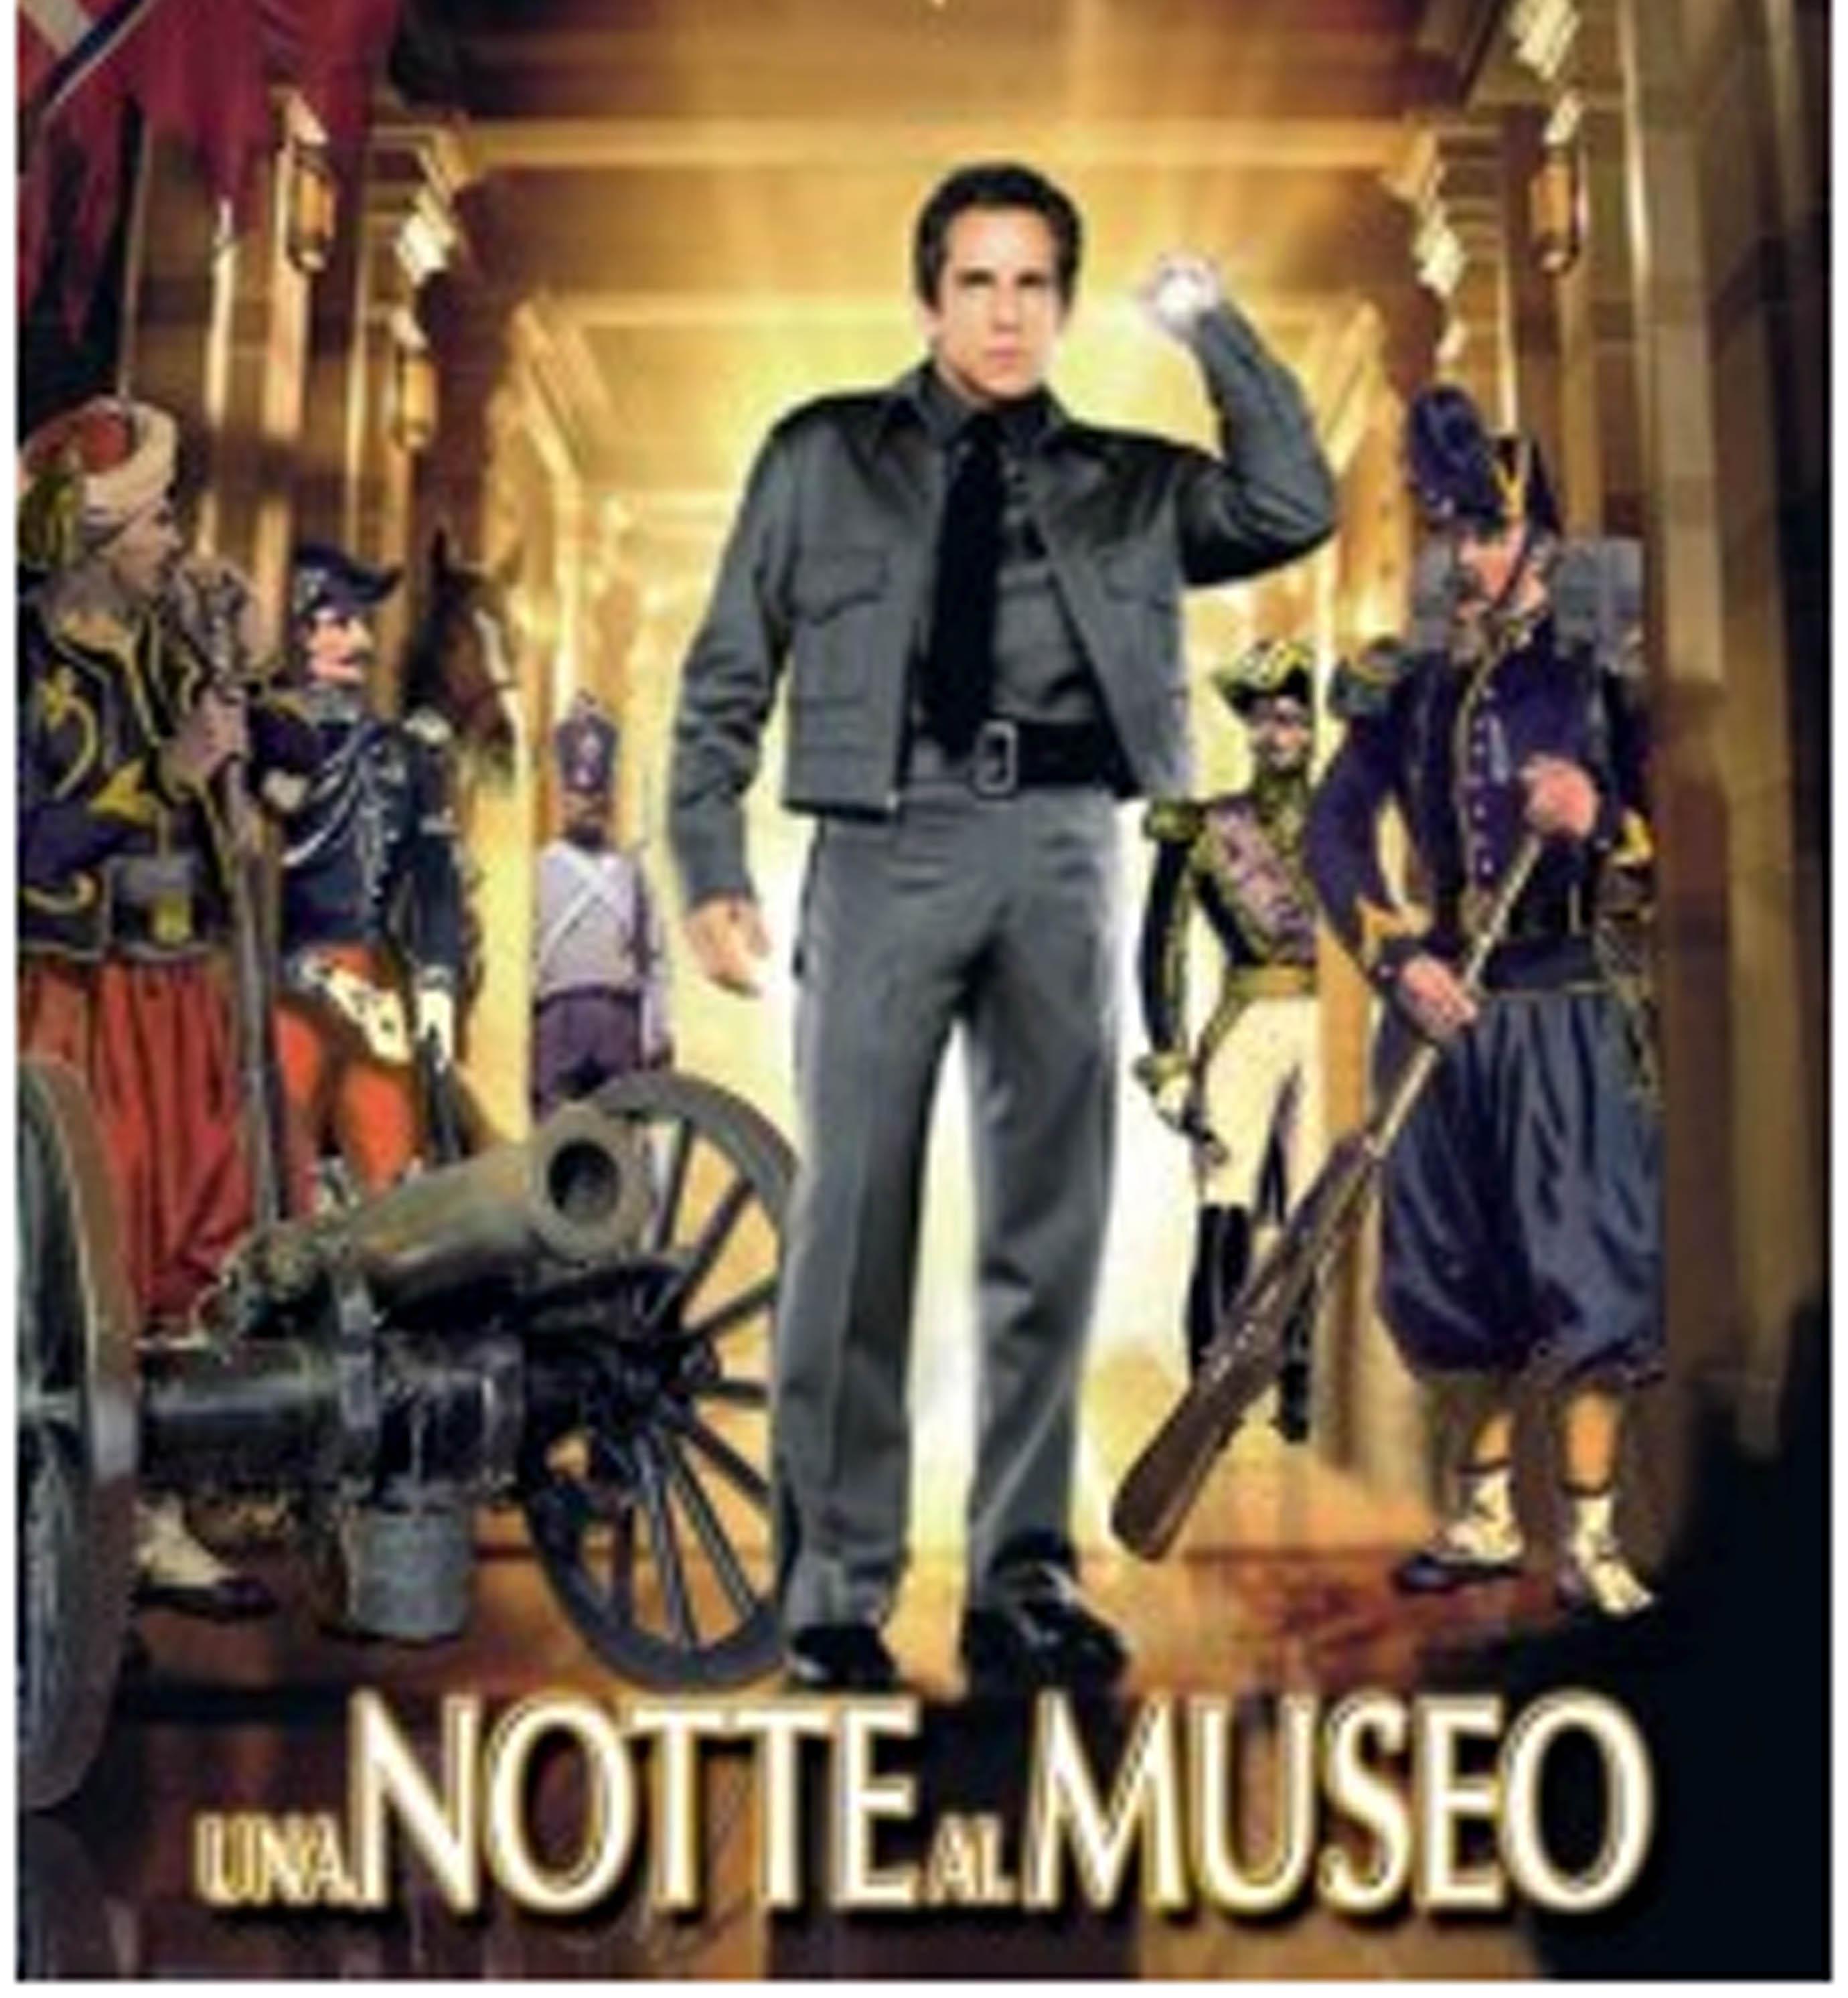 Notte Al Museo.Una Notte Al Museo Mincio Dintorni